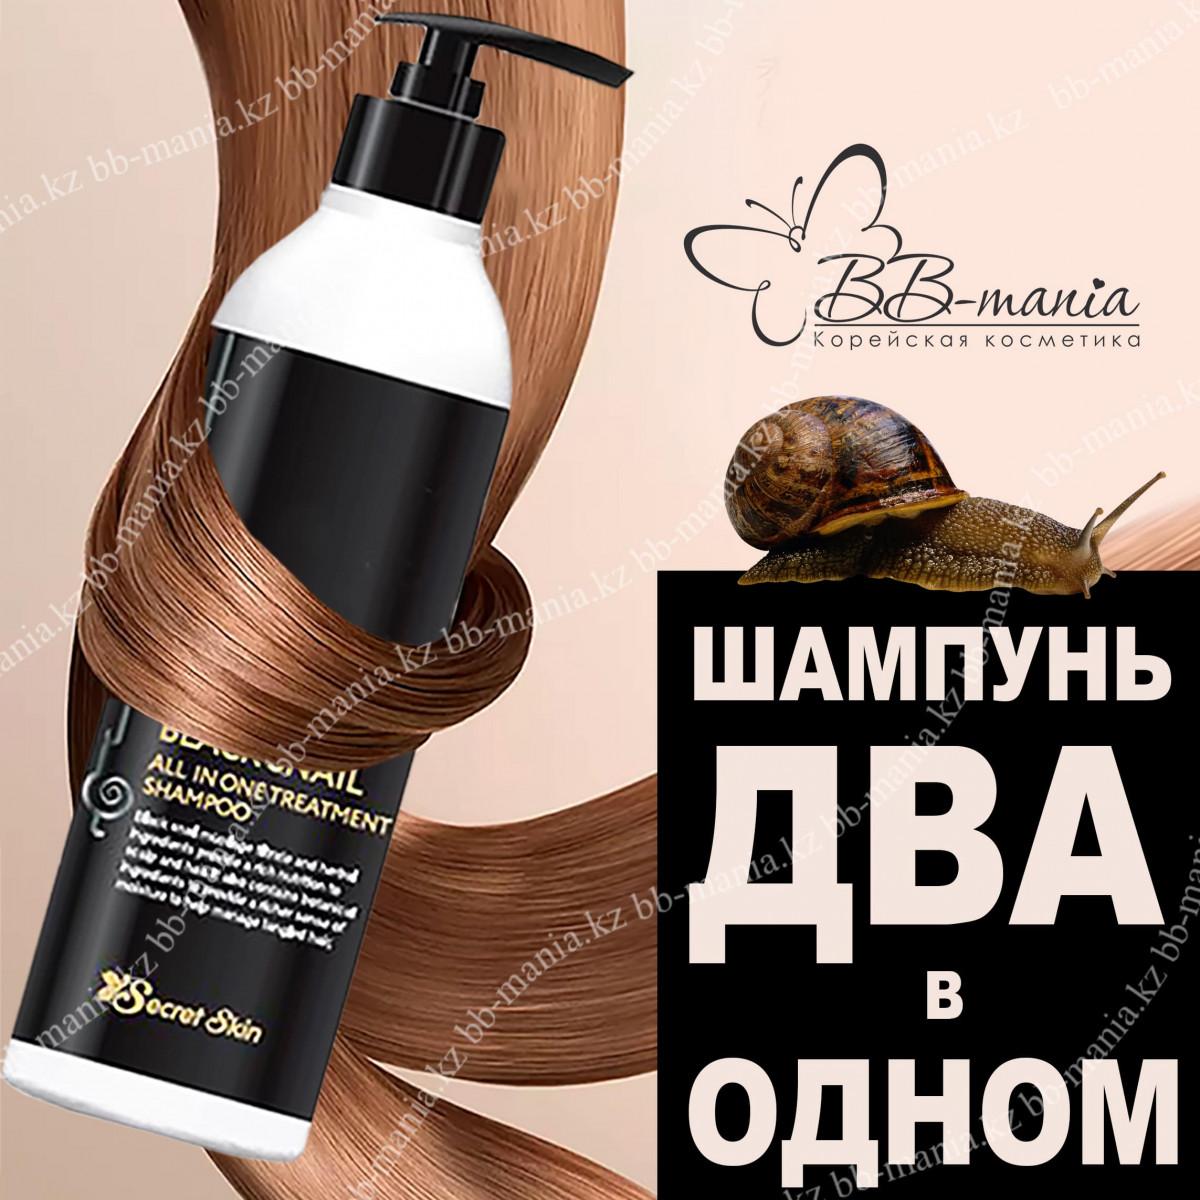 Black Snail All In One Treatment Shampoo [SECRET SKIN]